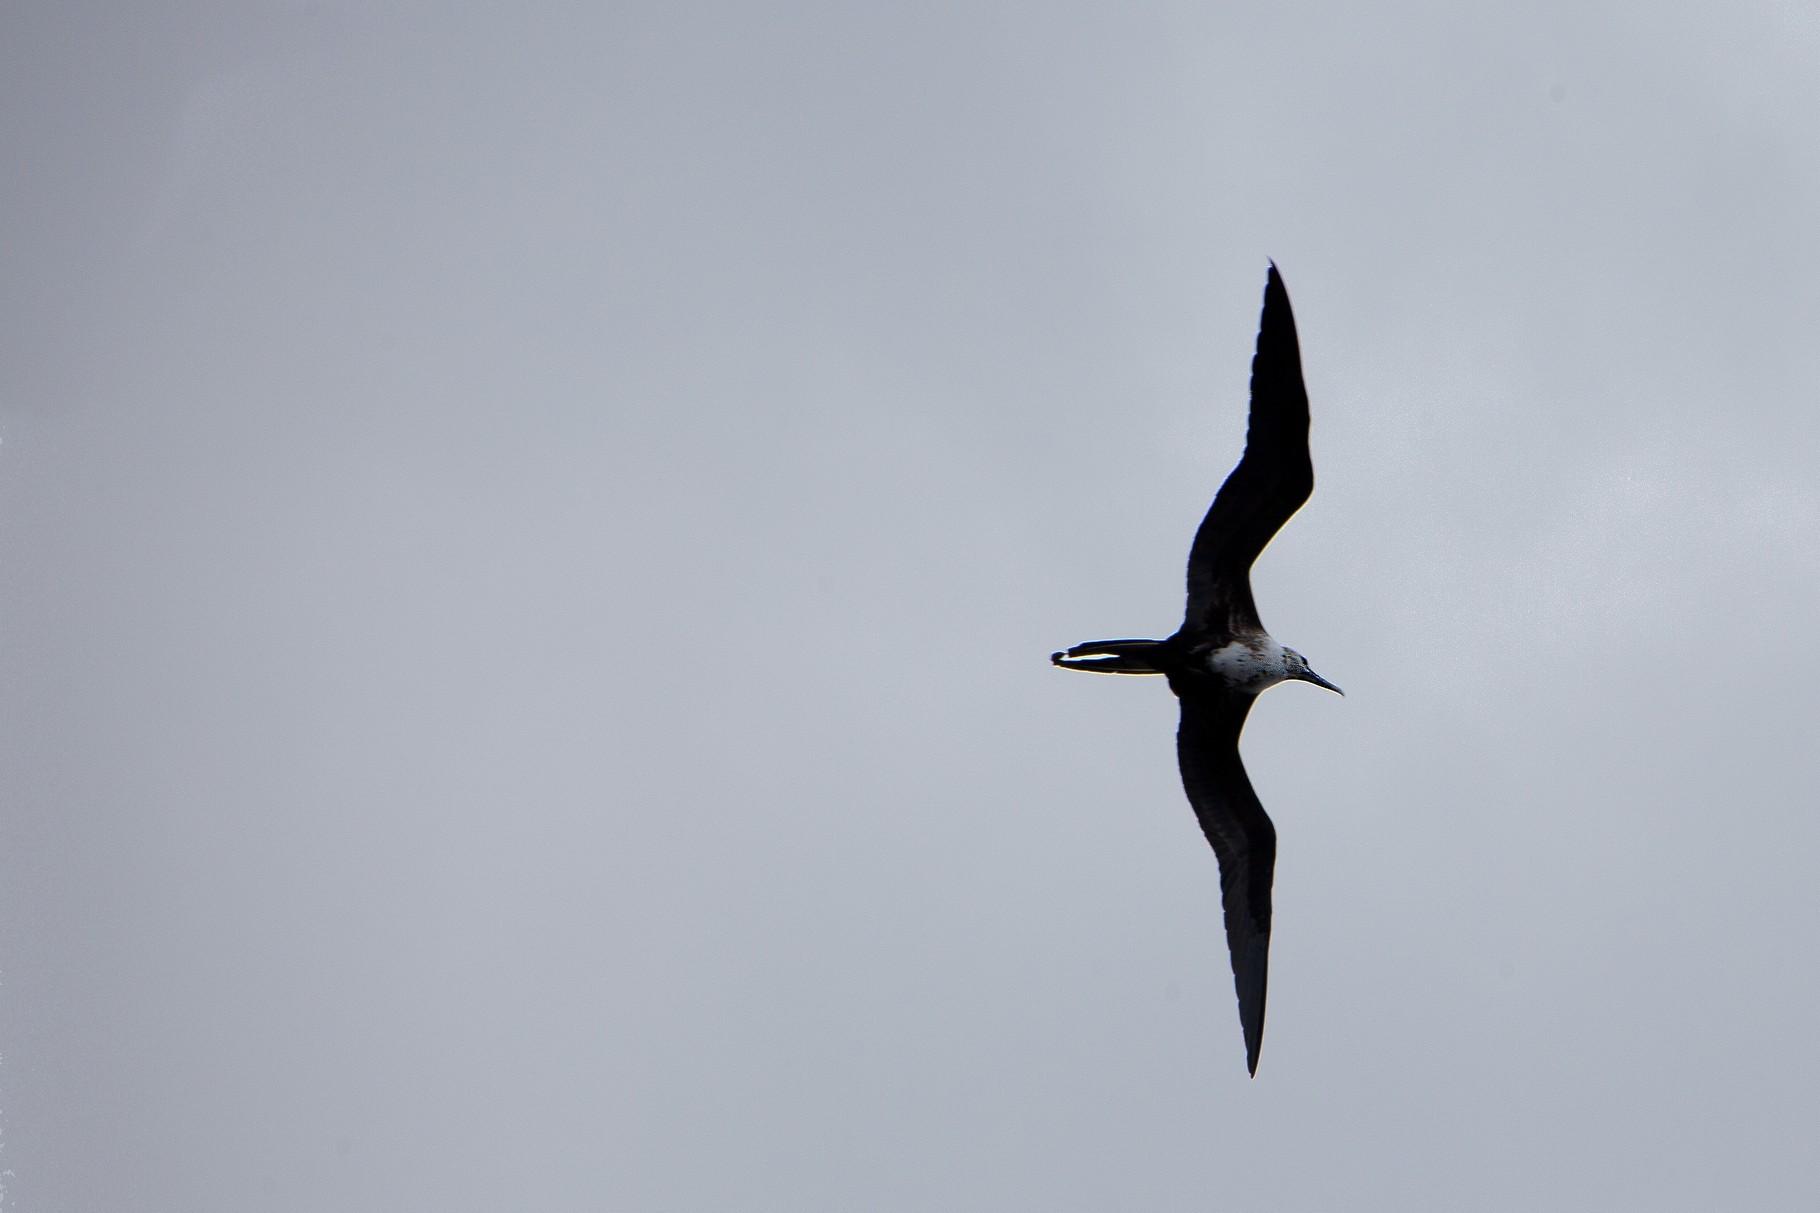 Fregattenvogel Aruba